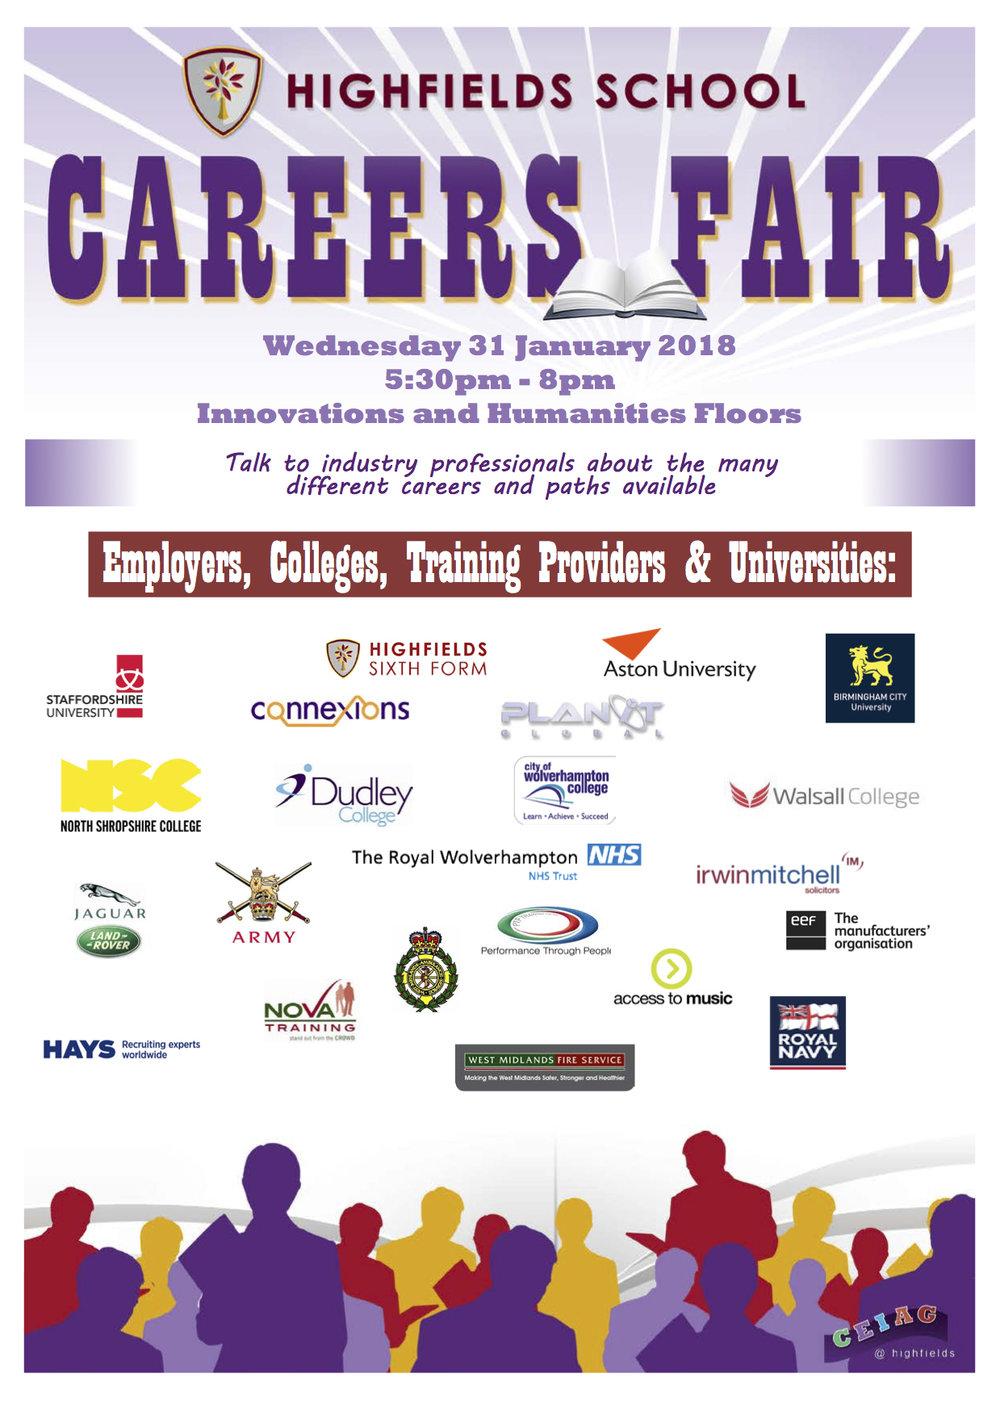 Careers Fair Poster 2018 - A4.jpg